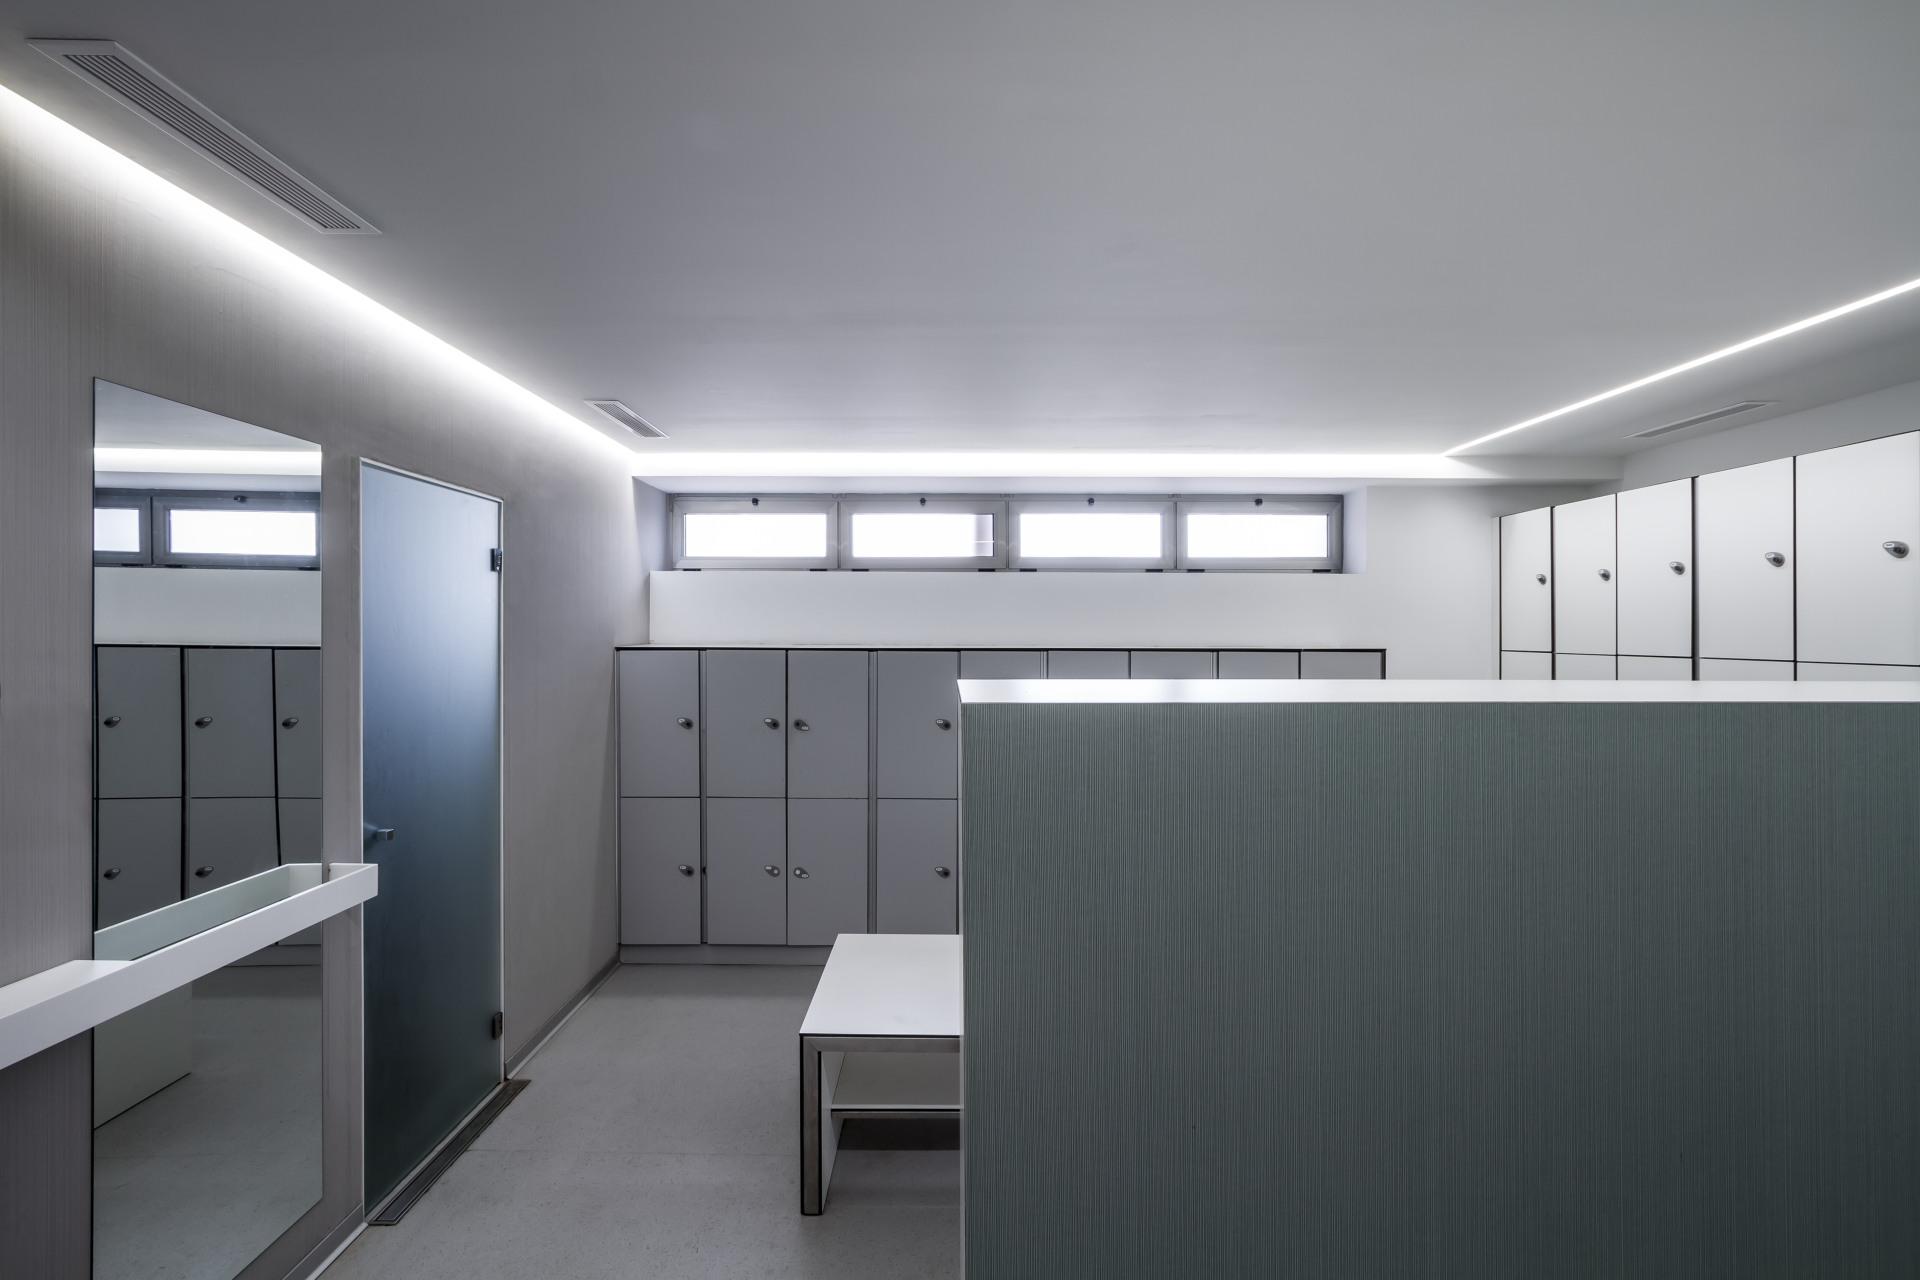 fotografia-arquitectura-valencia-german-cabo-bfm-edificatoria-club-tenis (9)